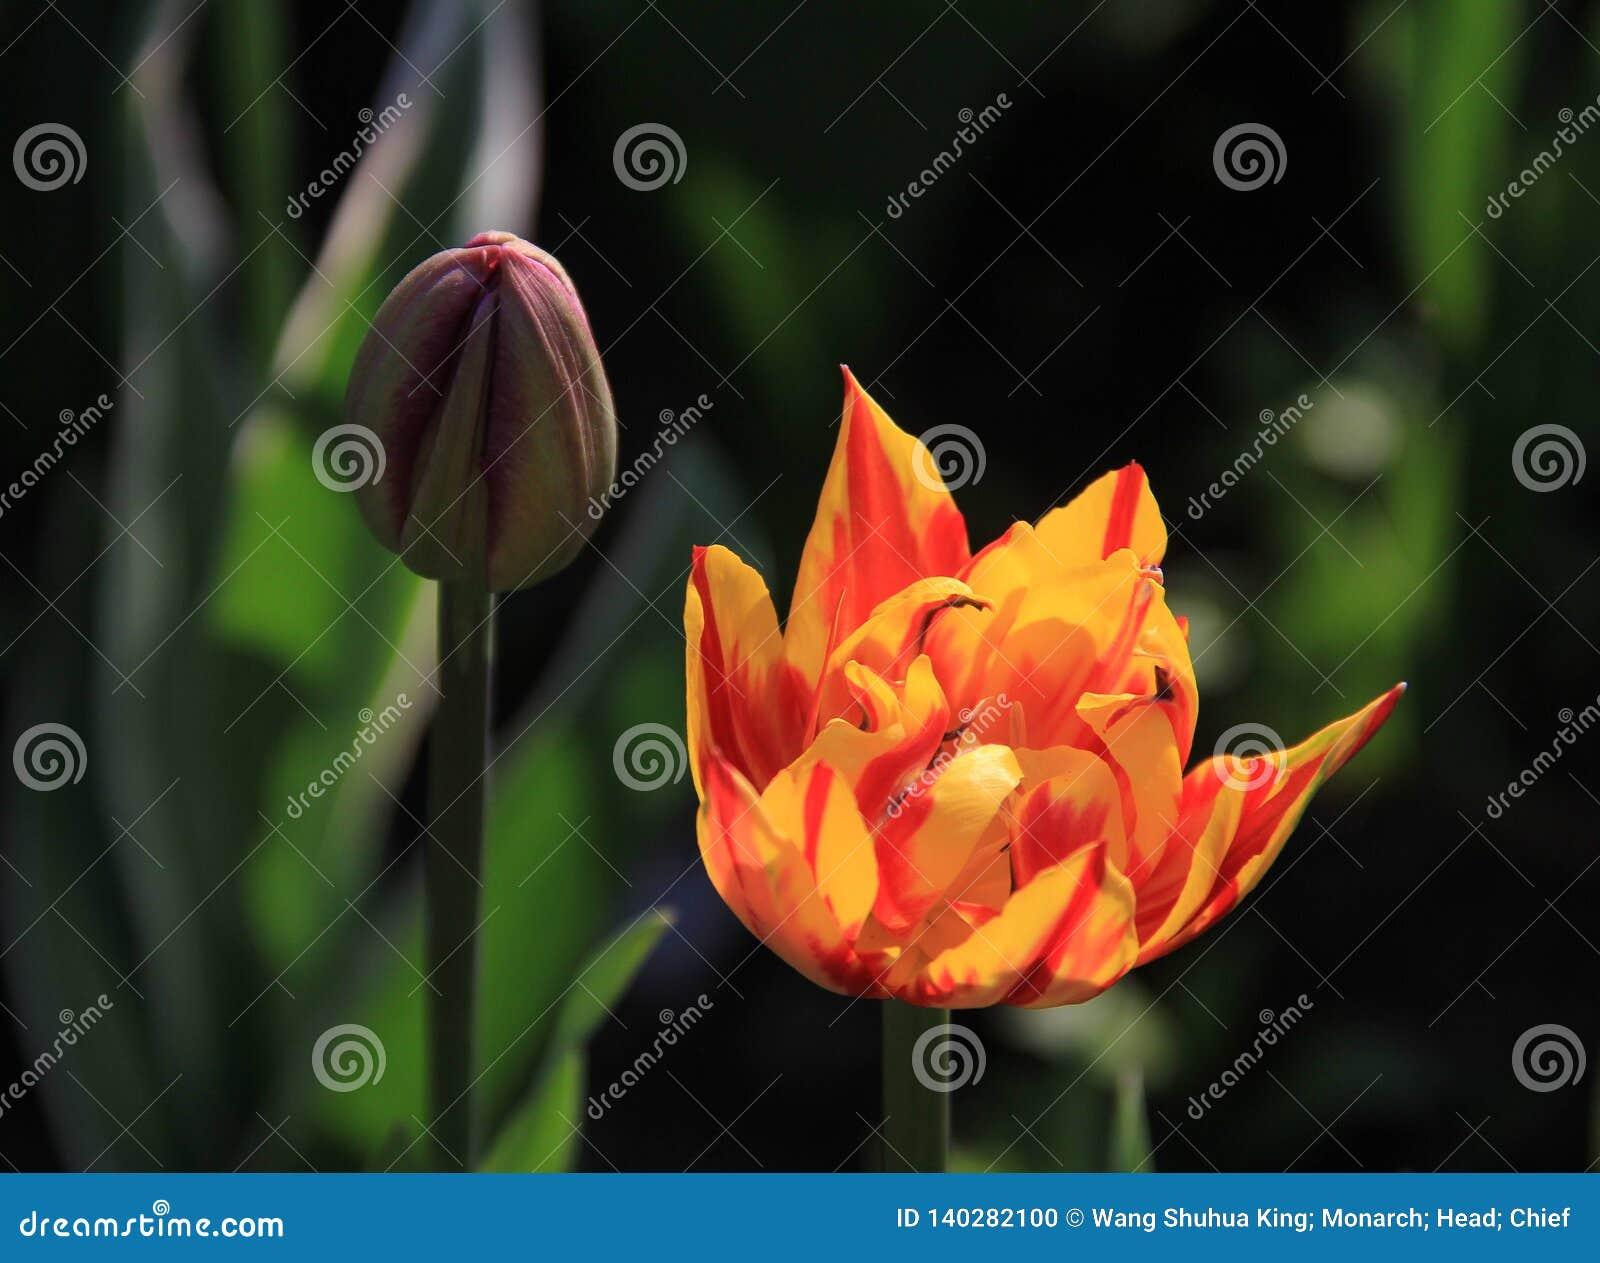 Цветок; цветорасположение